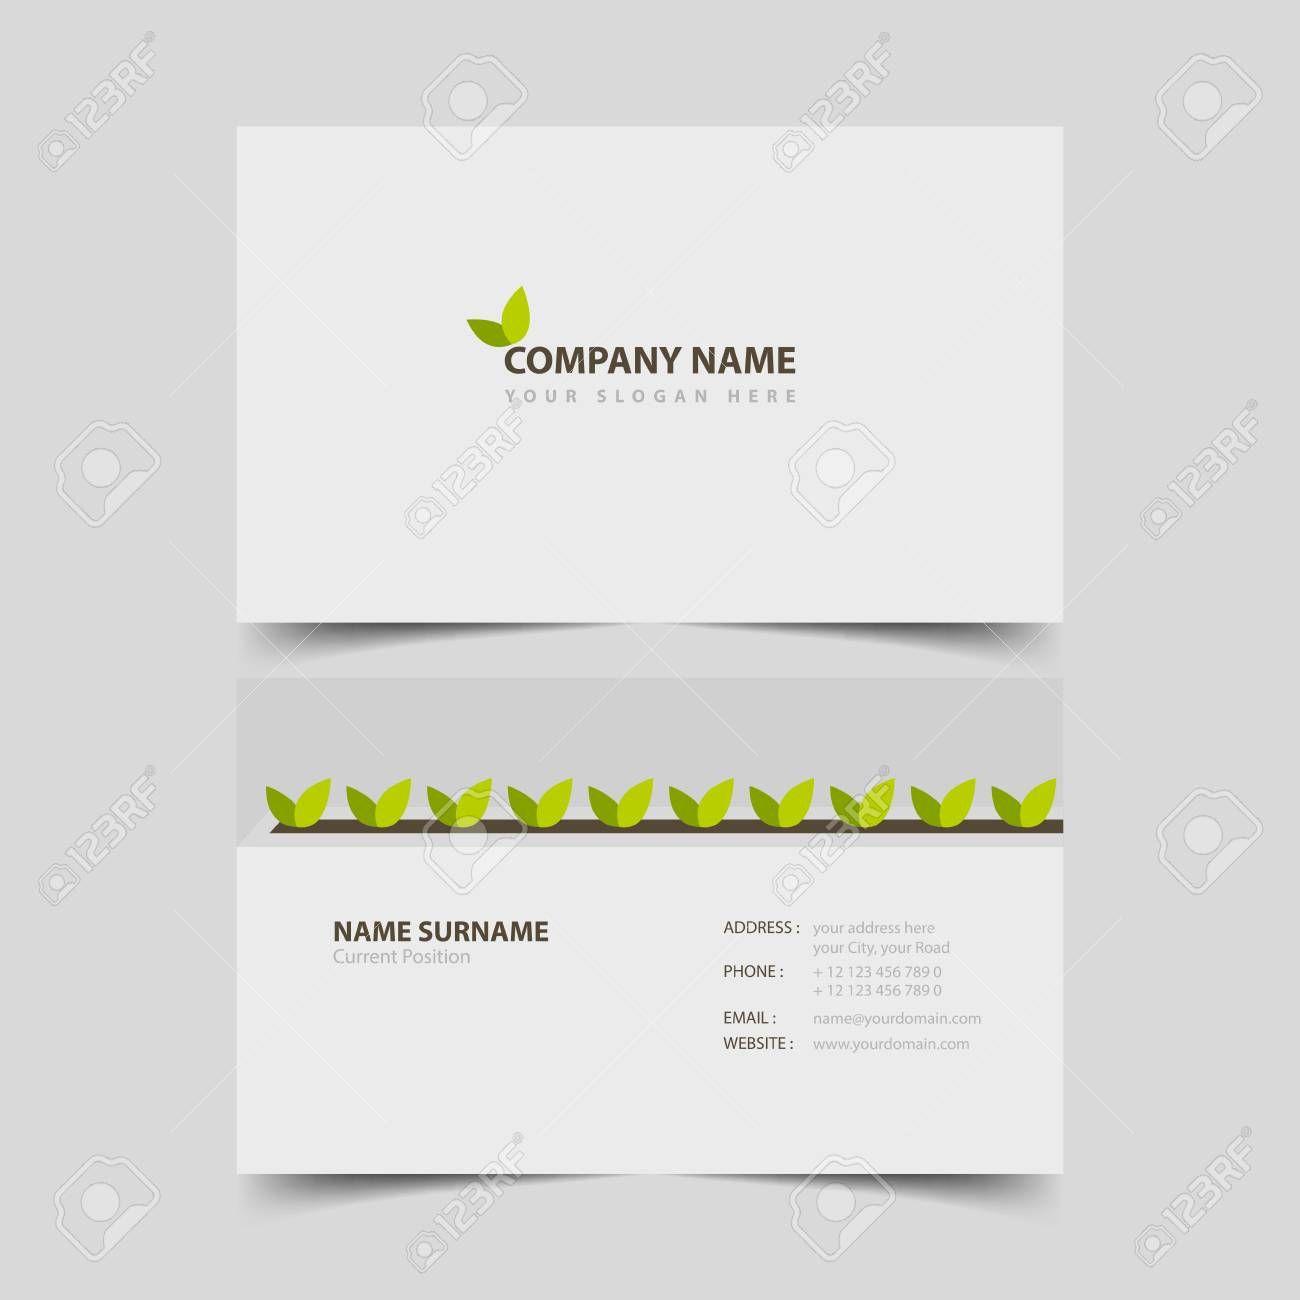 The Extraordinary Gardener Business Card Design Template Inside Business Card Template Design Photography Business Cards Template Free Business Card Templates